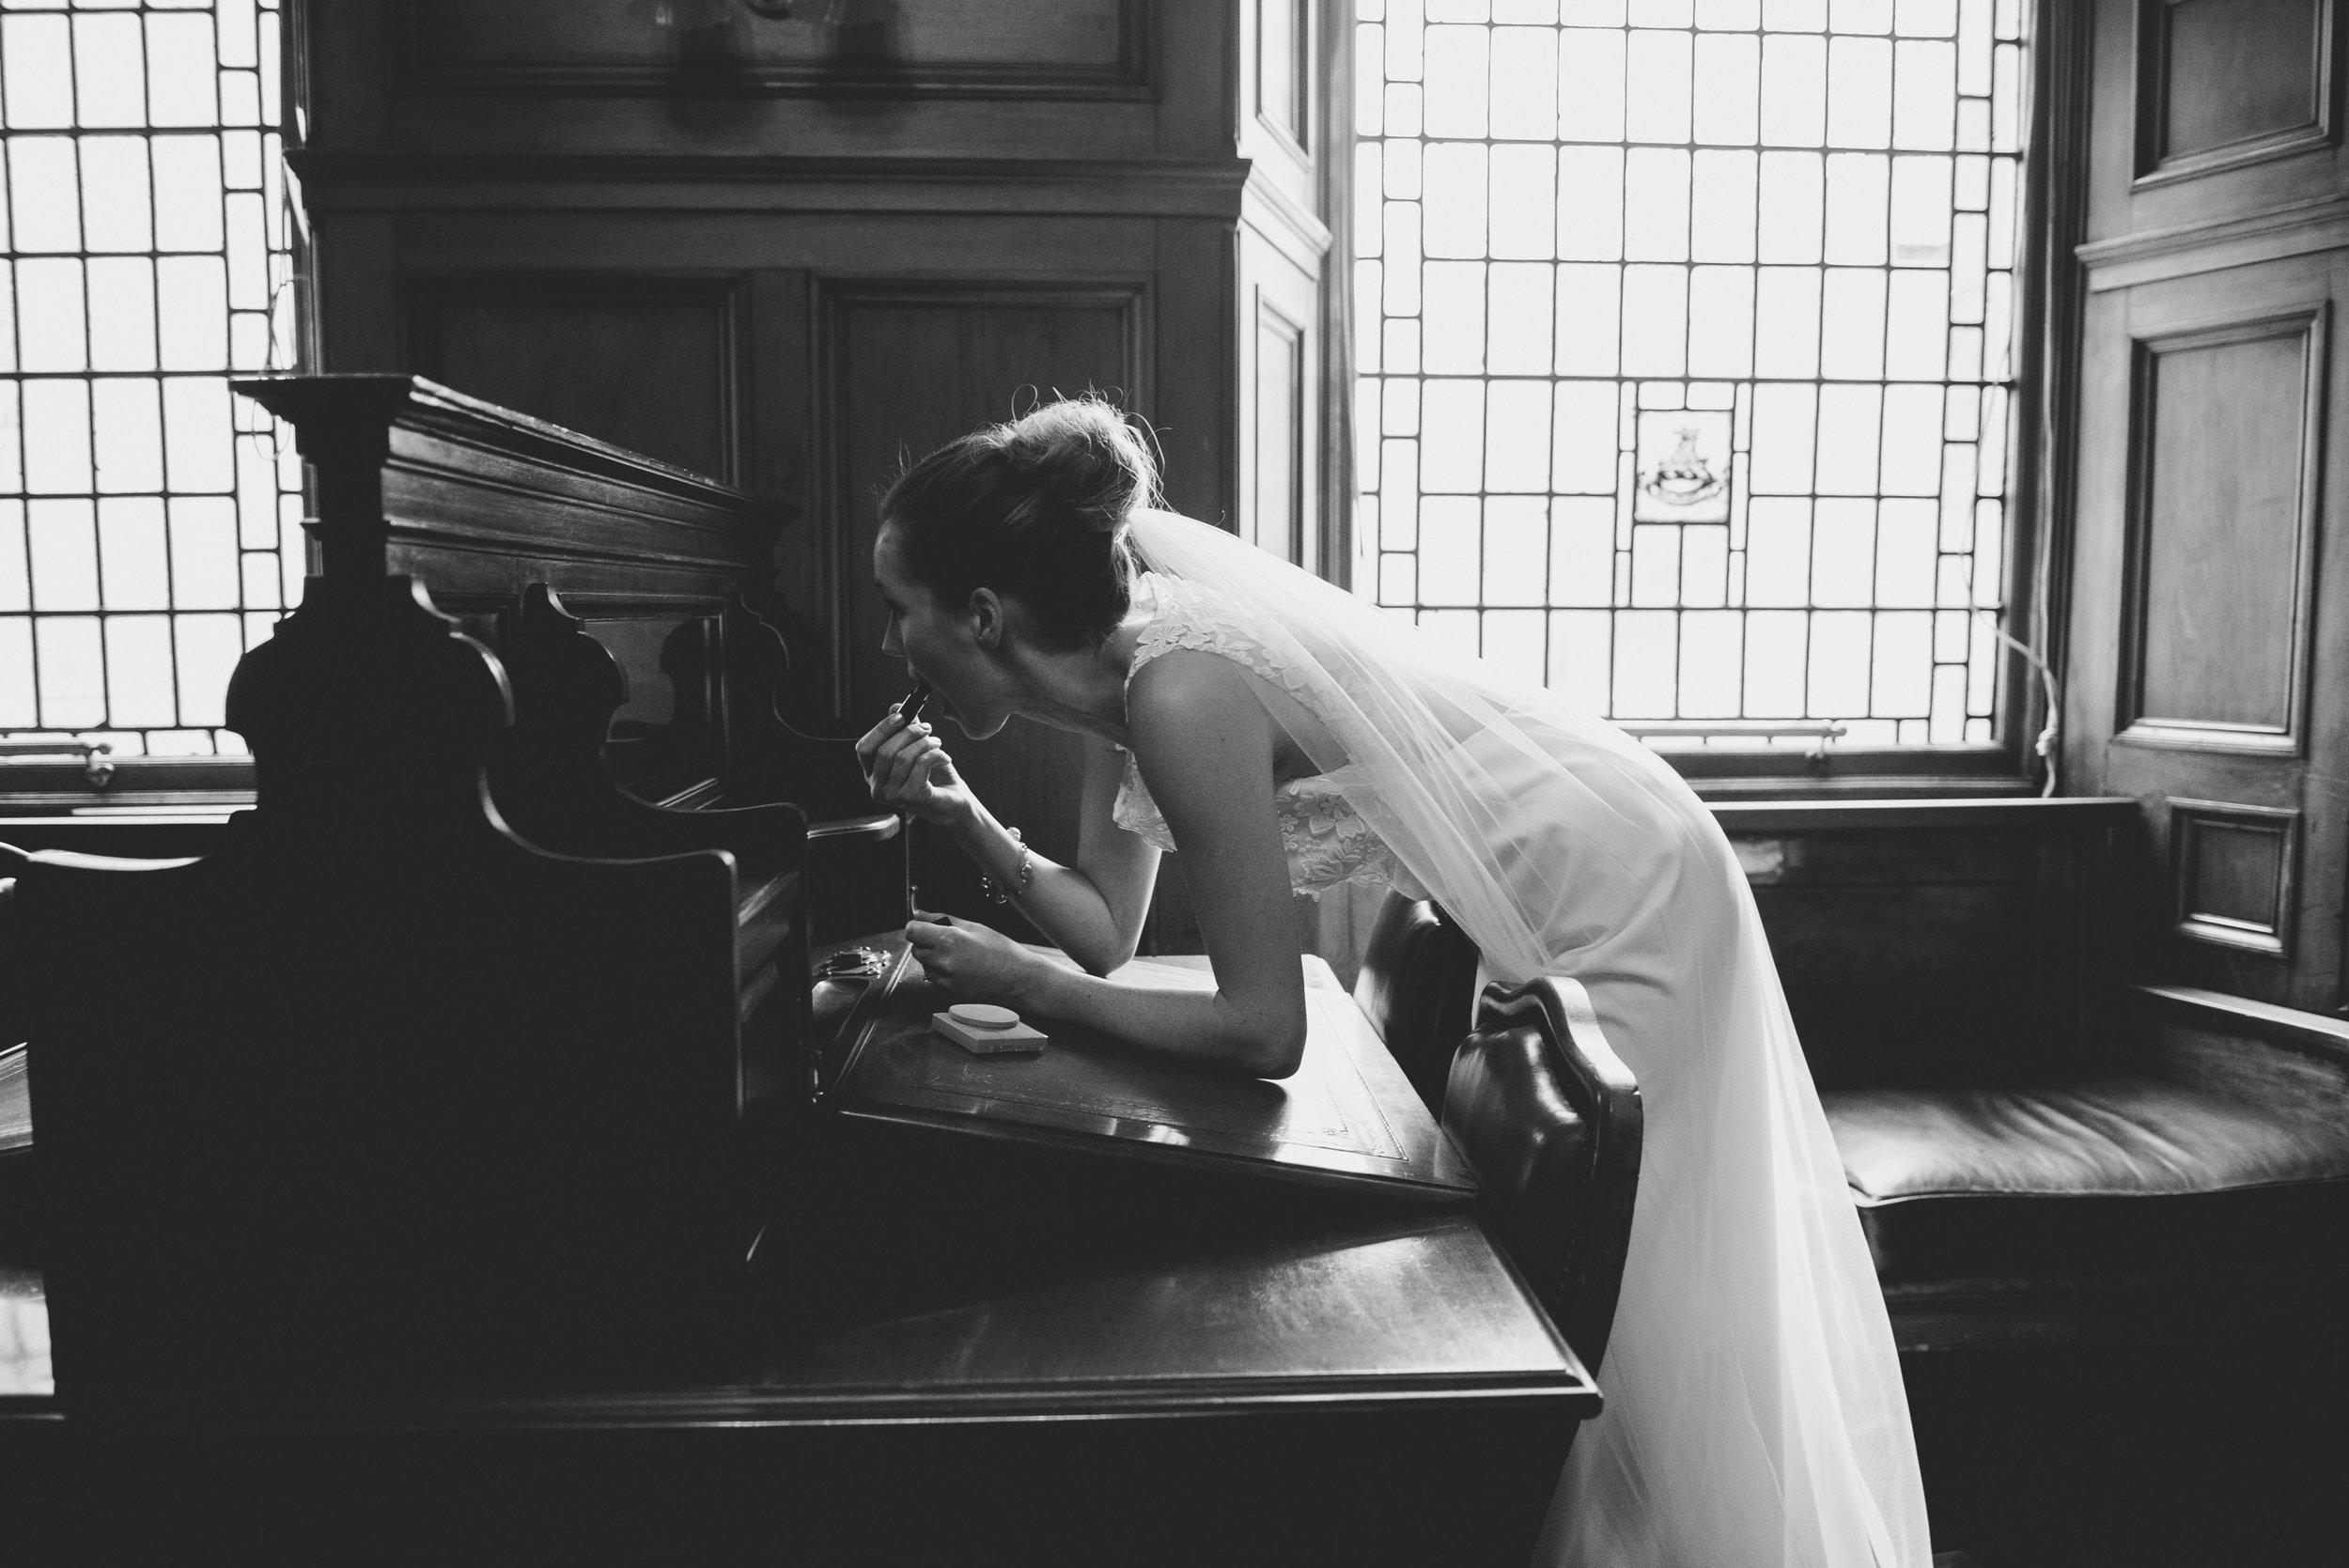 0214-LISA-DEVINE-PHOTOGRAPHY-ALTERNATIVE-WEDDING-PHOTOGRAPHY-SCOTLAND-DESTINATION-WEDDINGS-GLASGOW-WEDDINGS-COOL-WEDDINGS-STYLISH-WEDDINGS.JPG